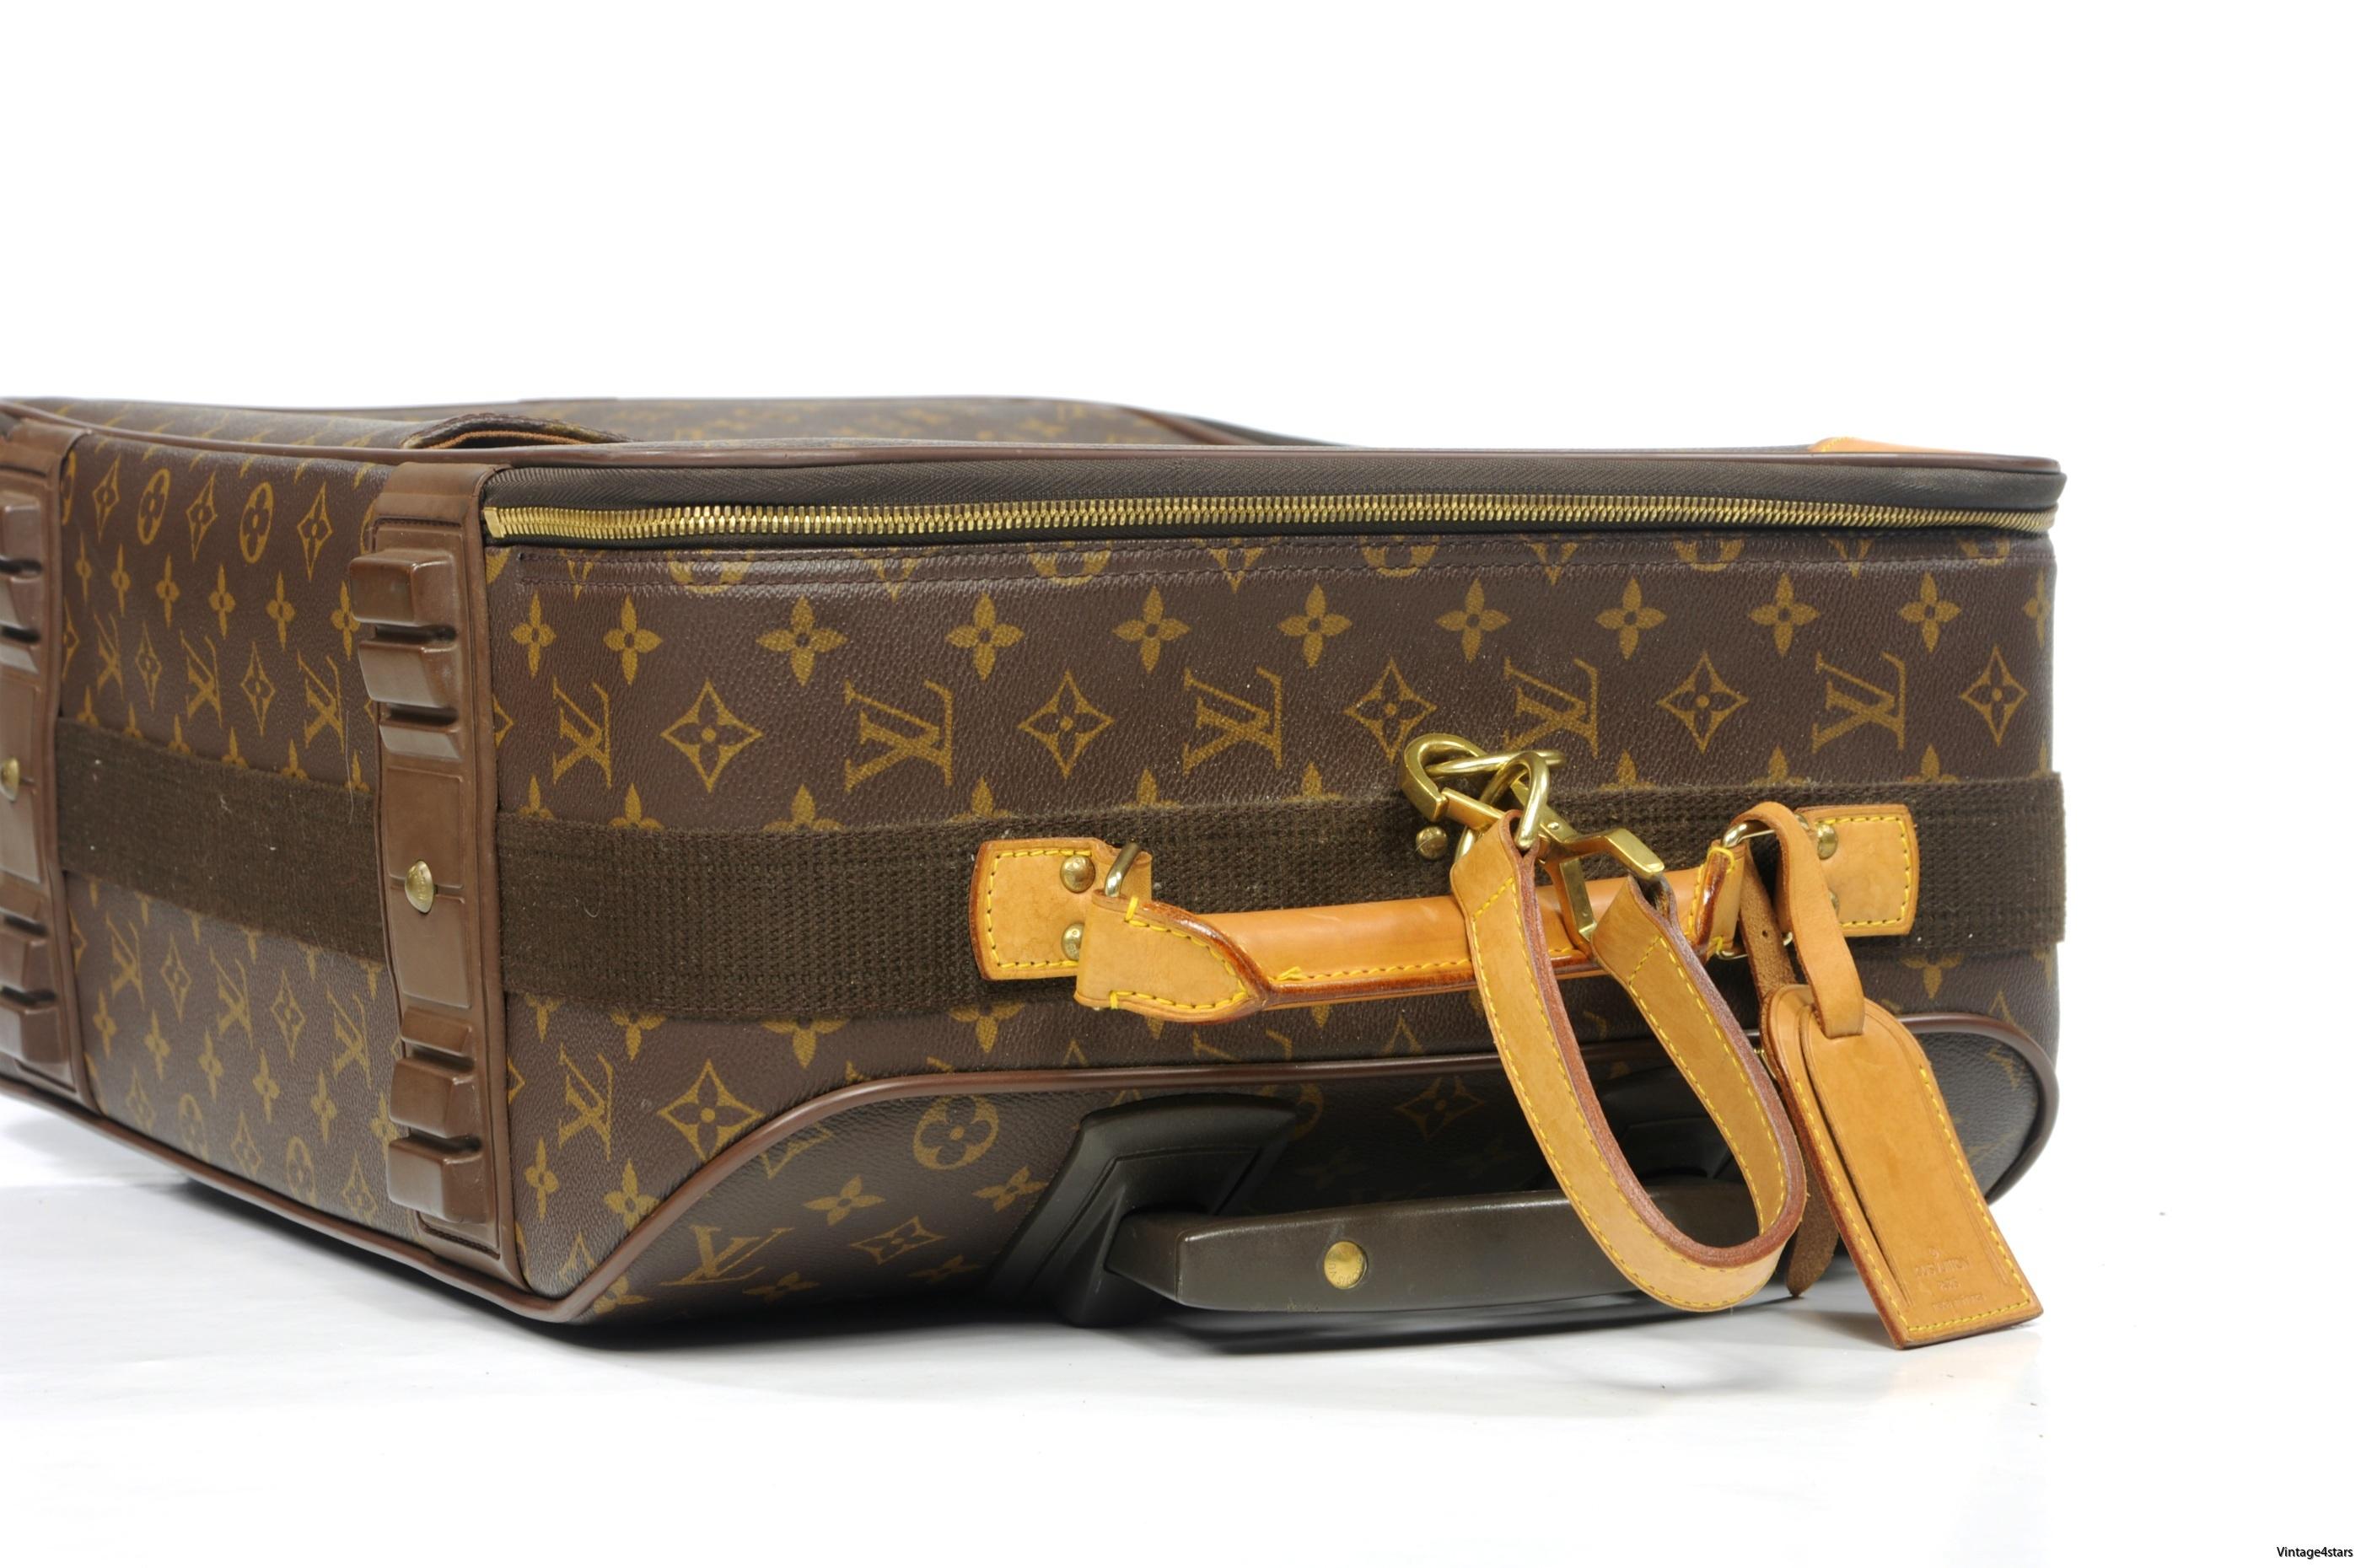 Louis Vuitton Pegase 55 Monogram 2